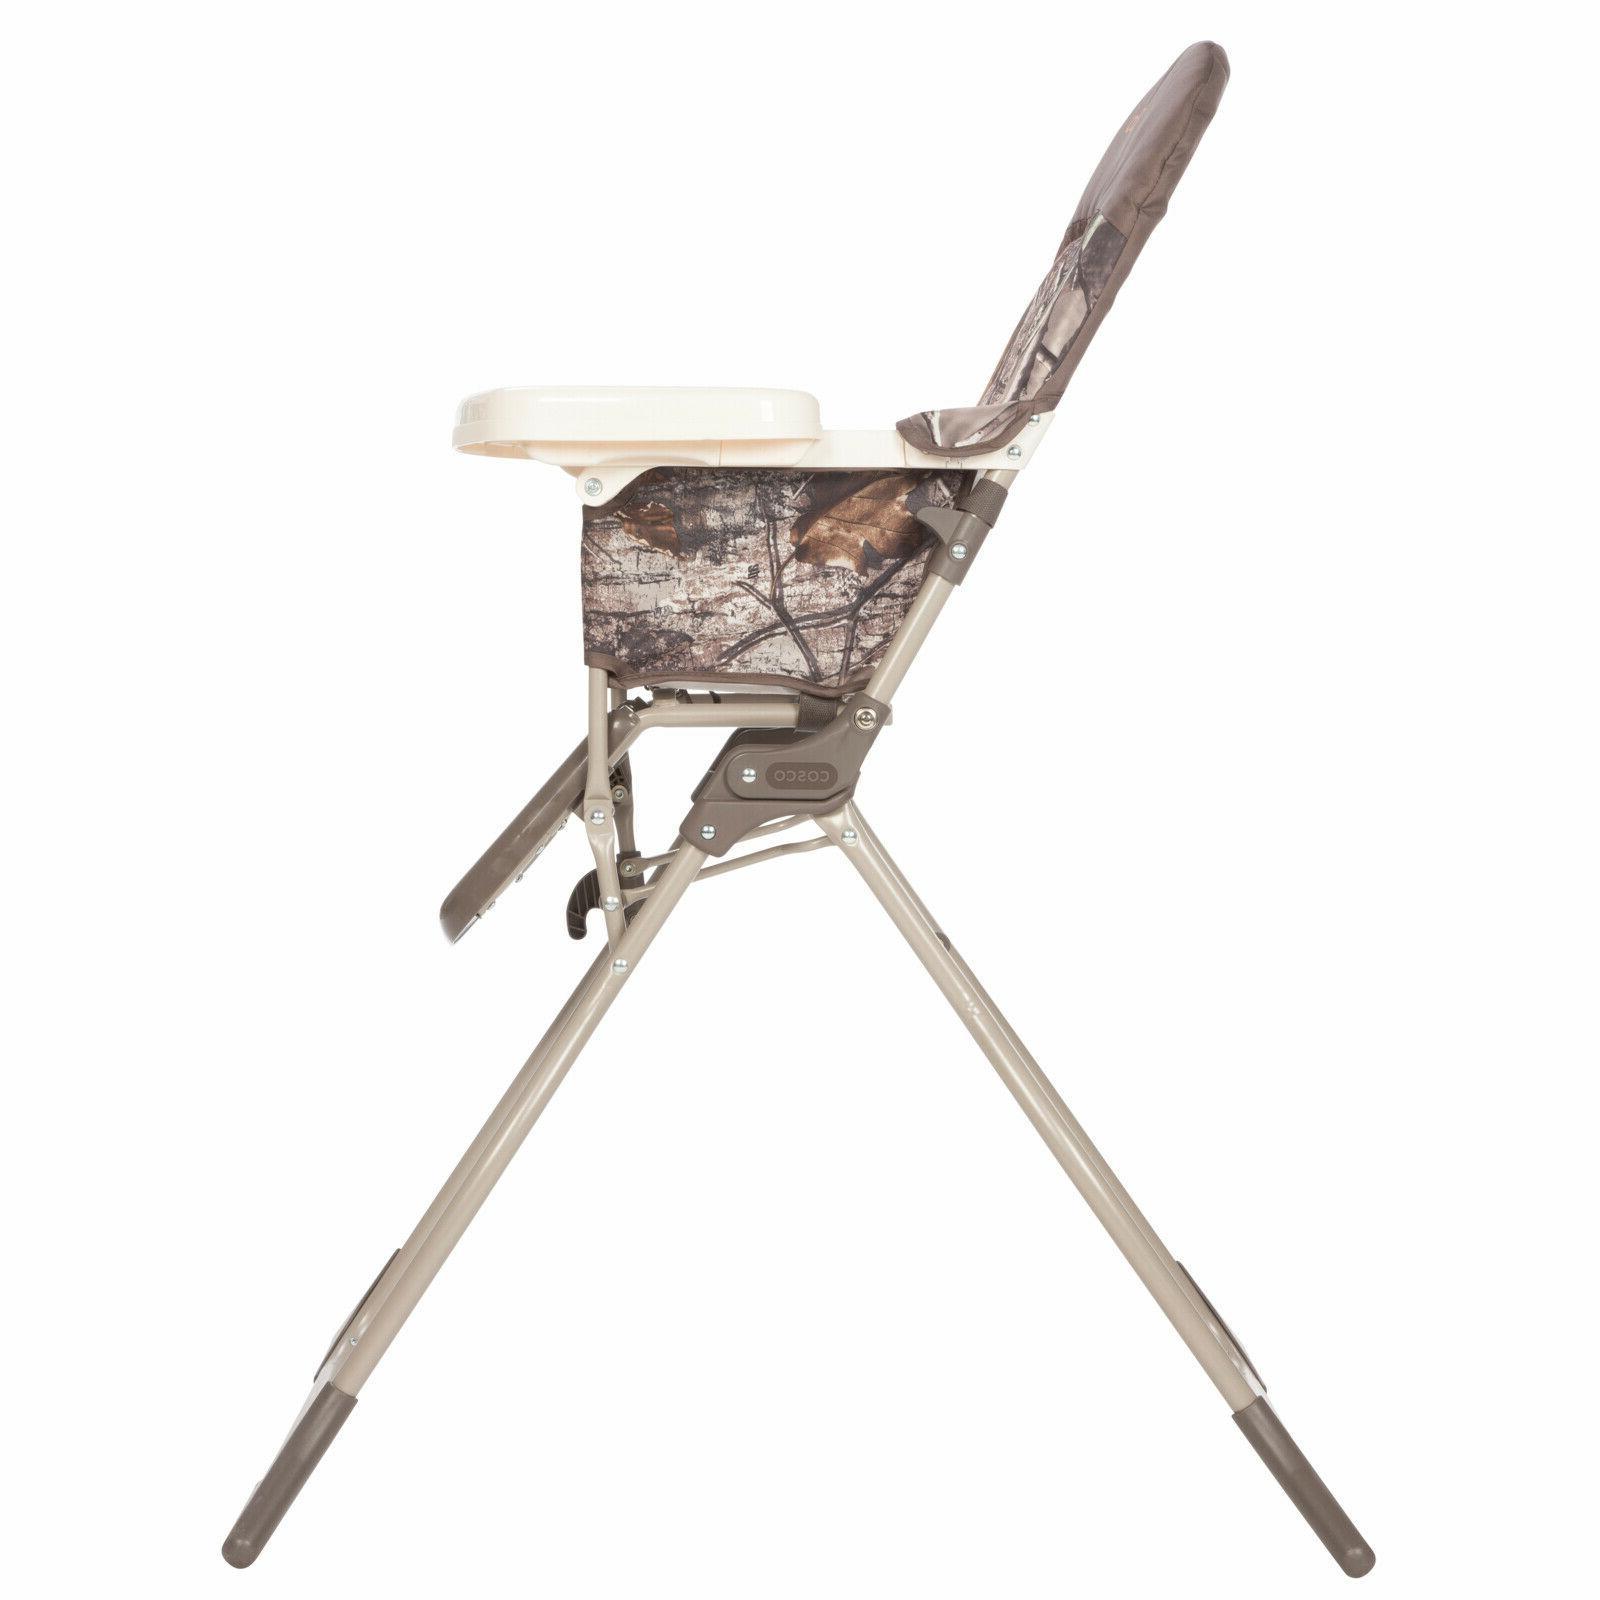 Baby High Chair Size Children Kids Feeding Seat Adjustable Tray